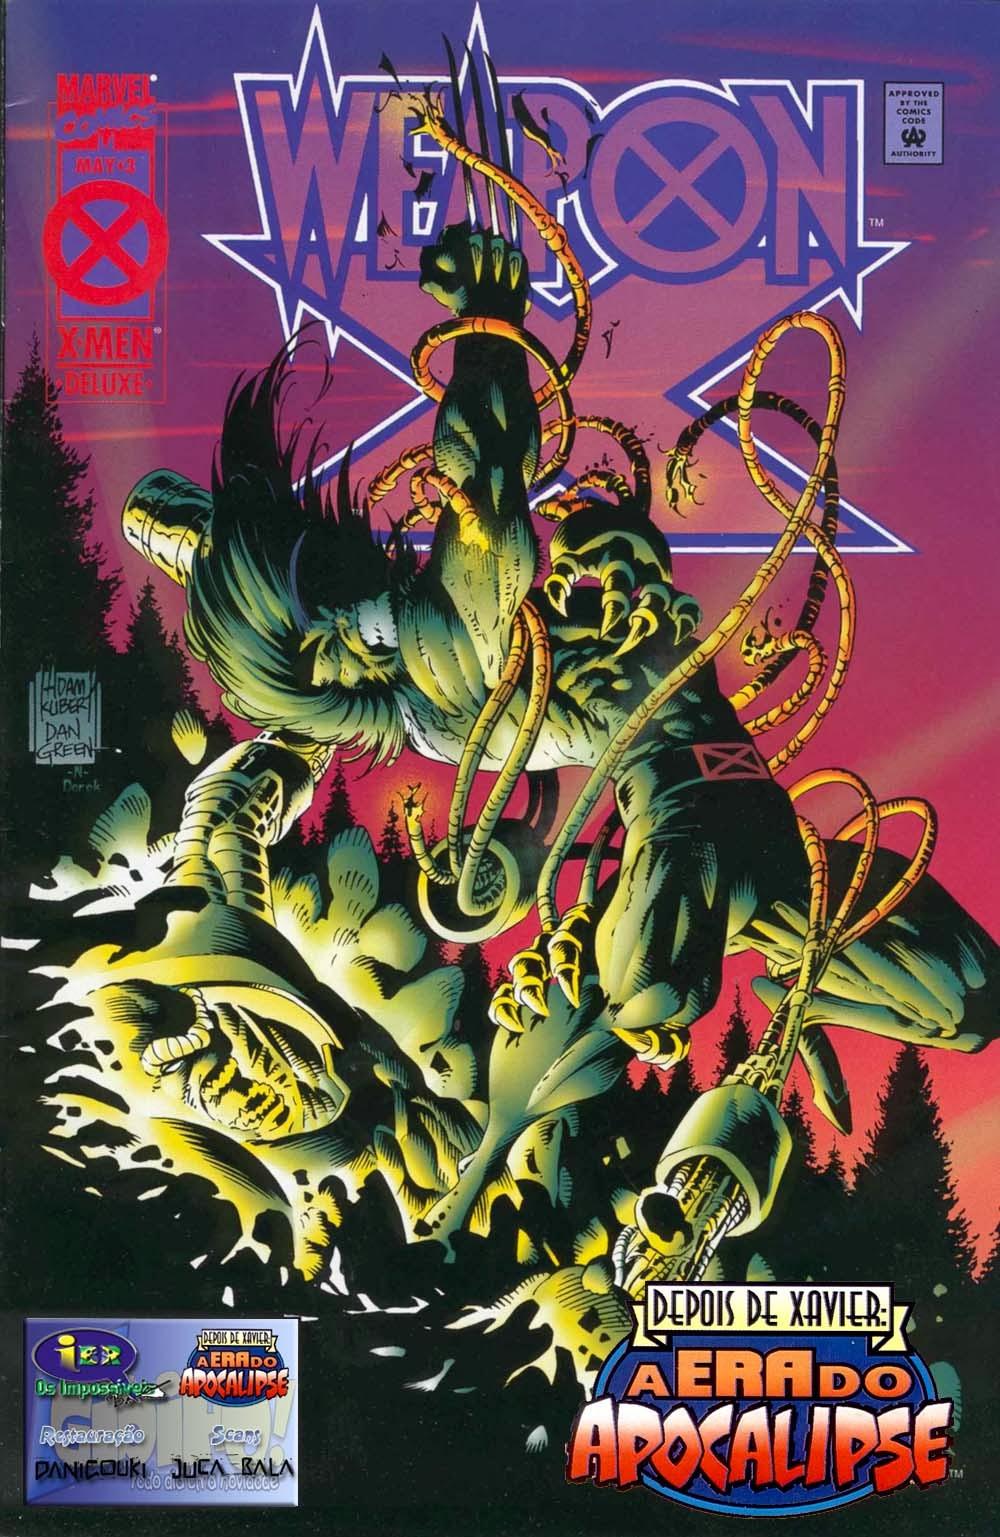 X-Men - A Era do Apocalipse #33